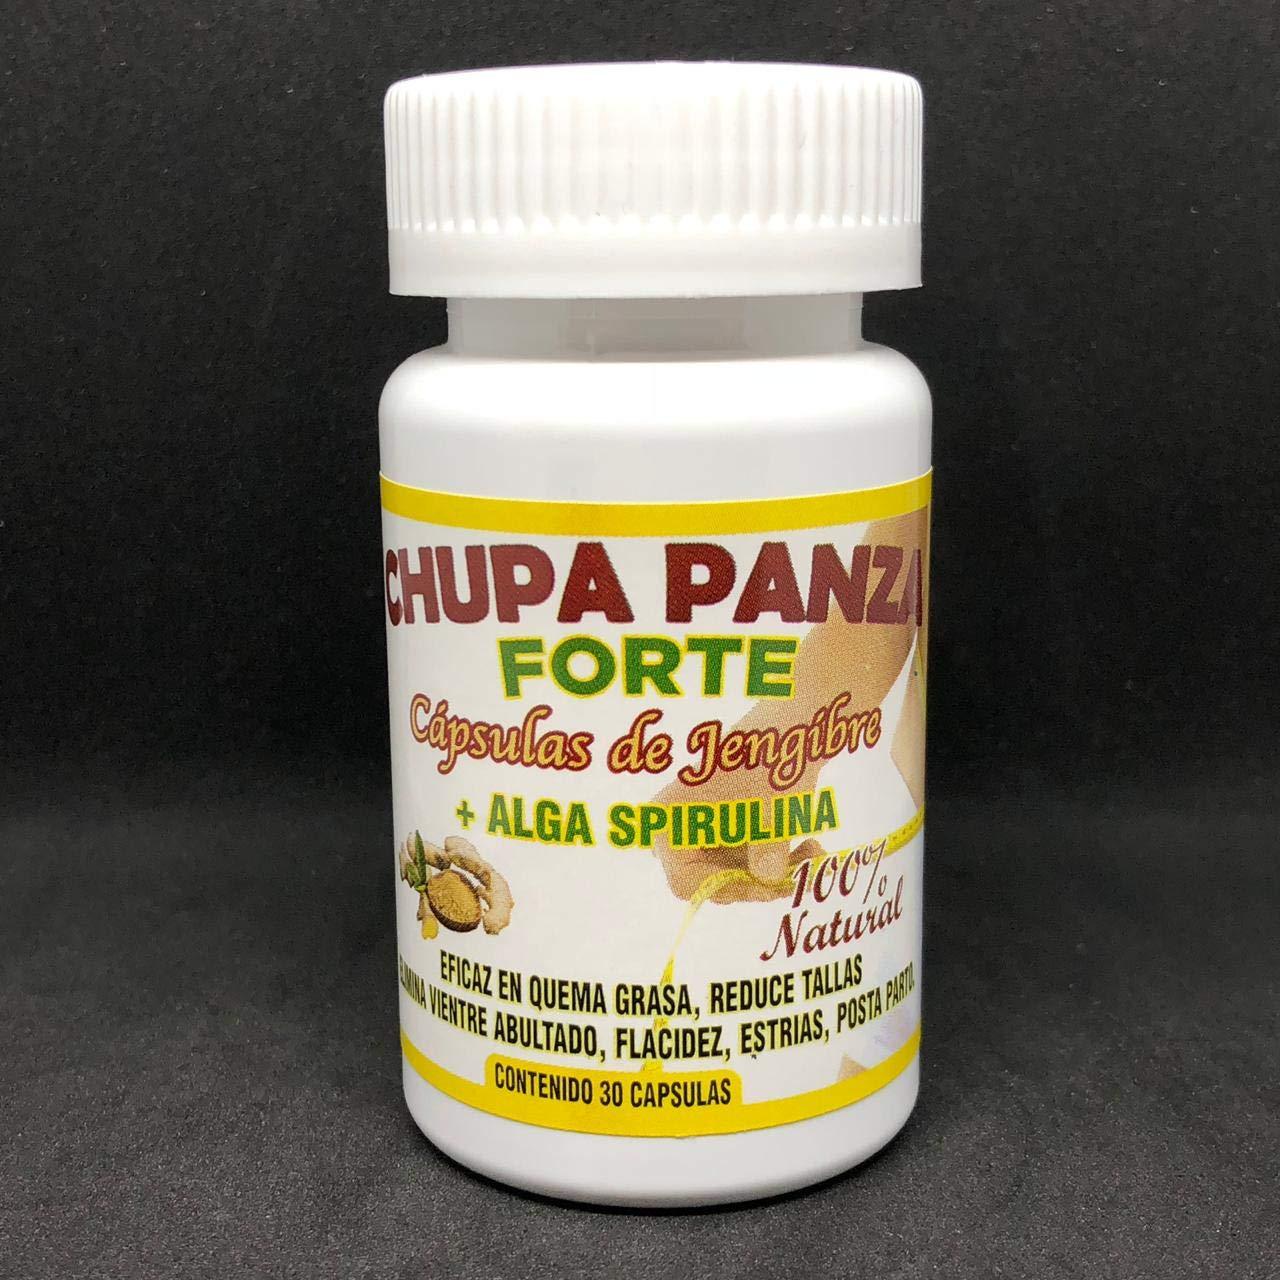 Amazon.com: Chupa Panza 60 Cap Jengibre+Alga Espirulina Quema Grasa ...